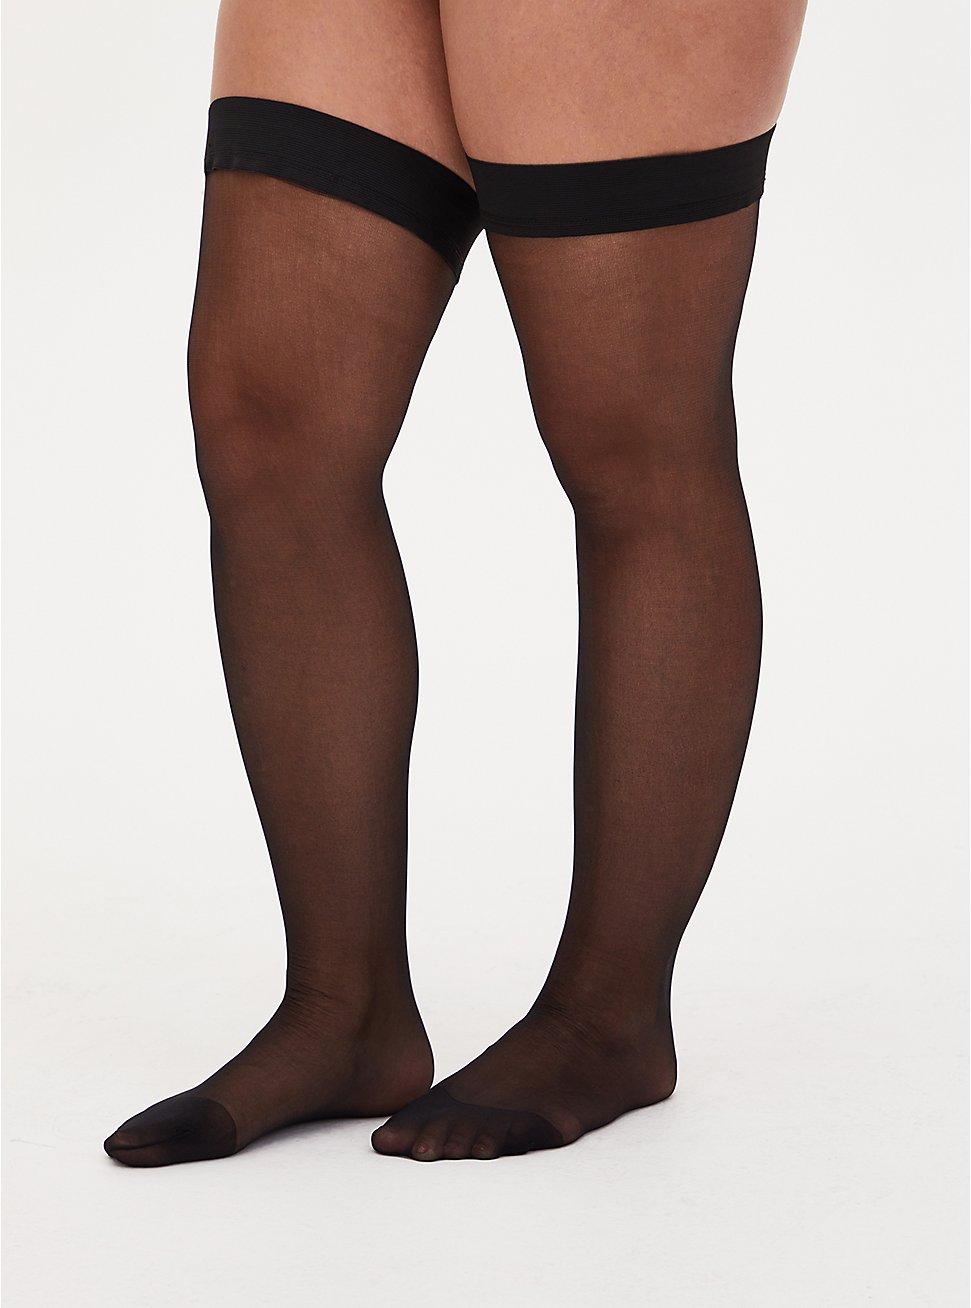 Black Thigh-High Opaque Tights , BLACK, hi-res